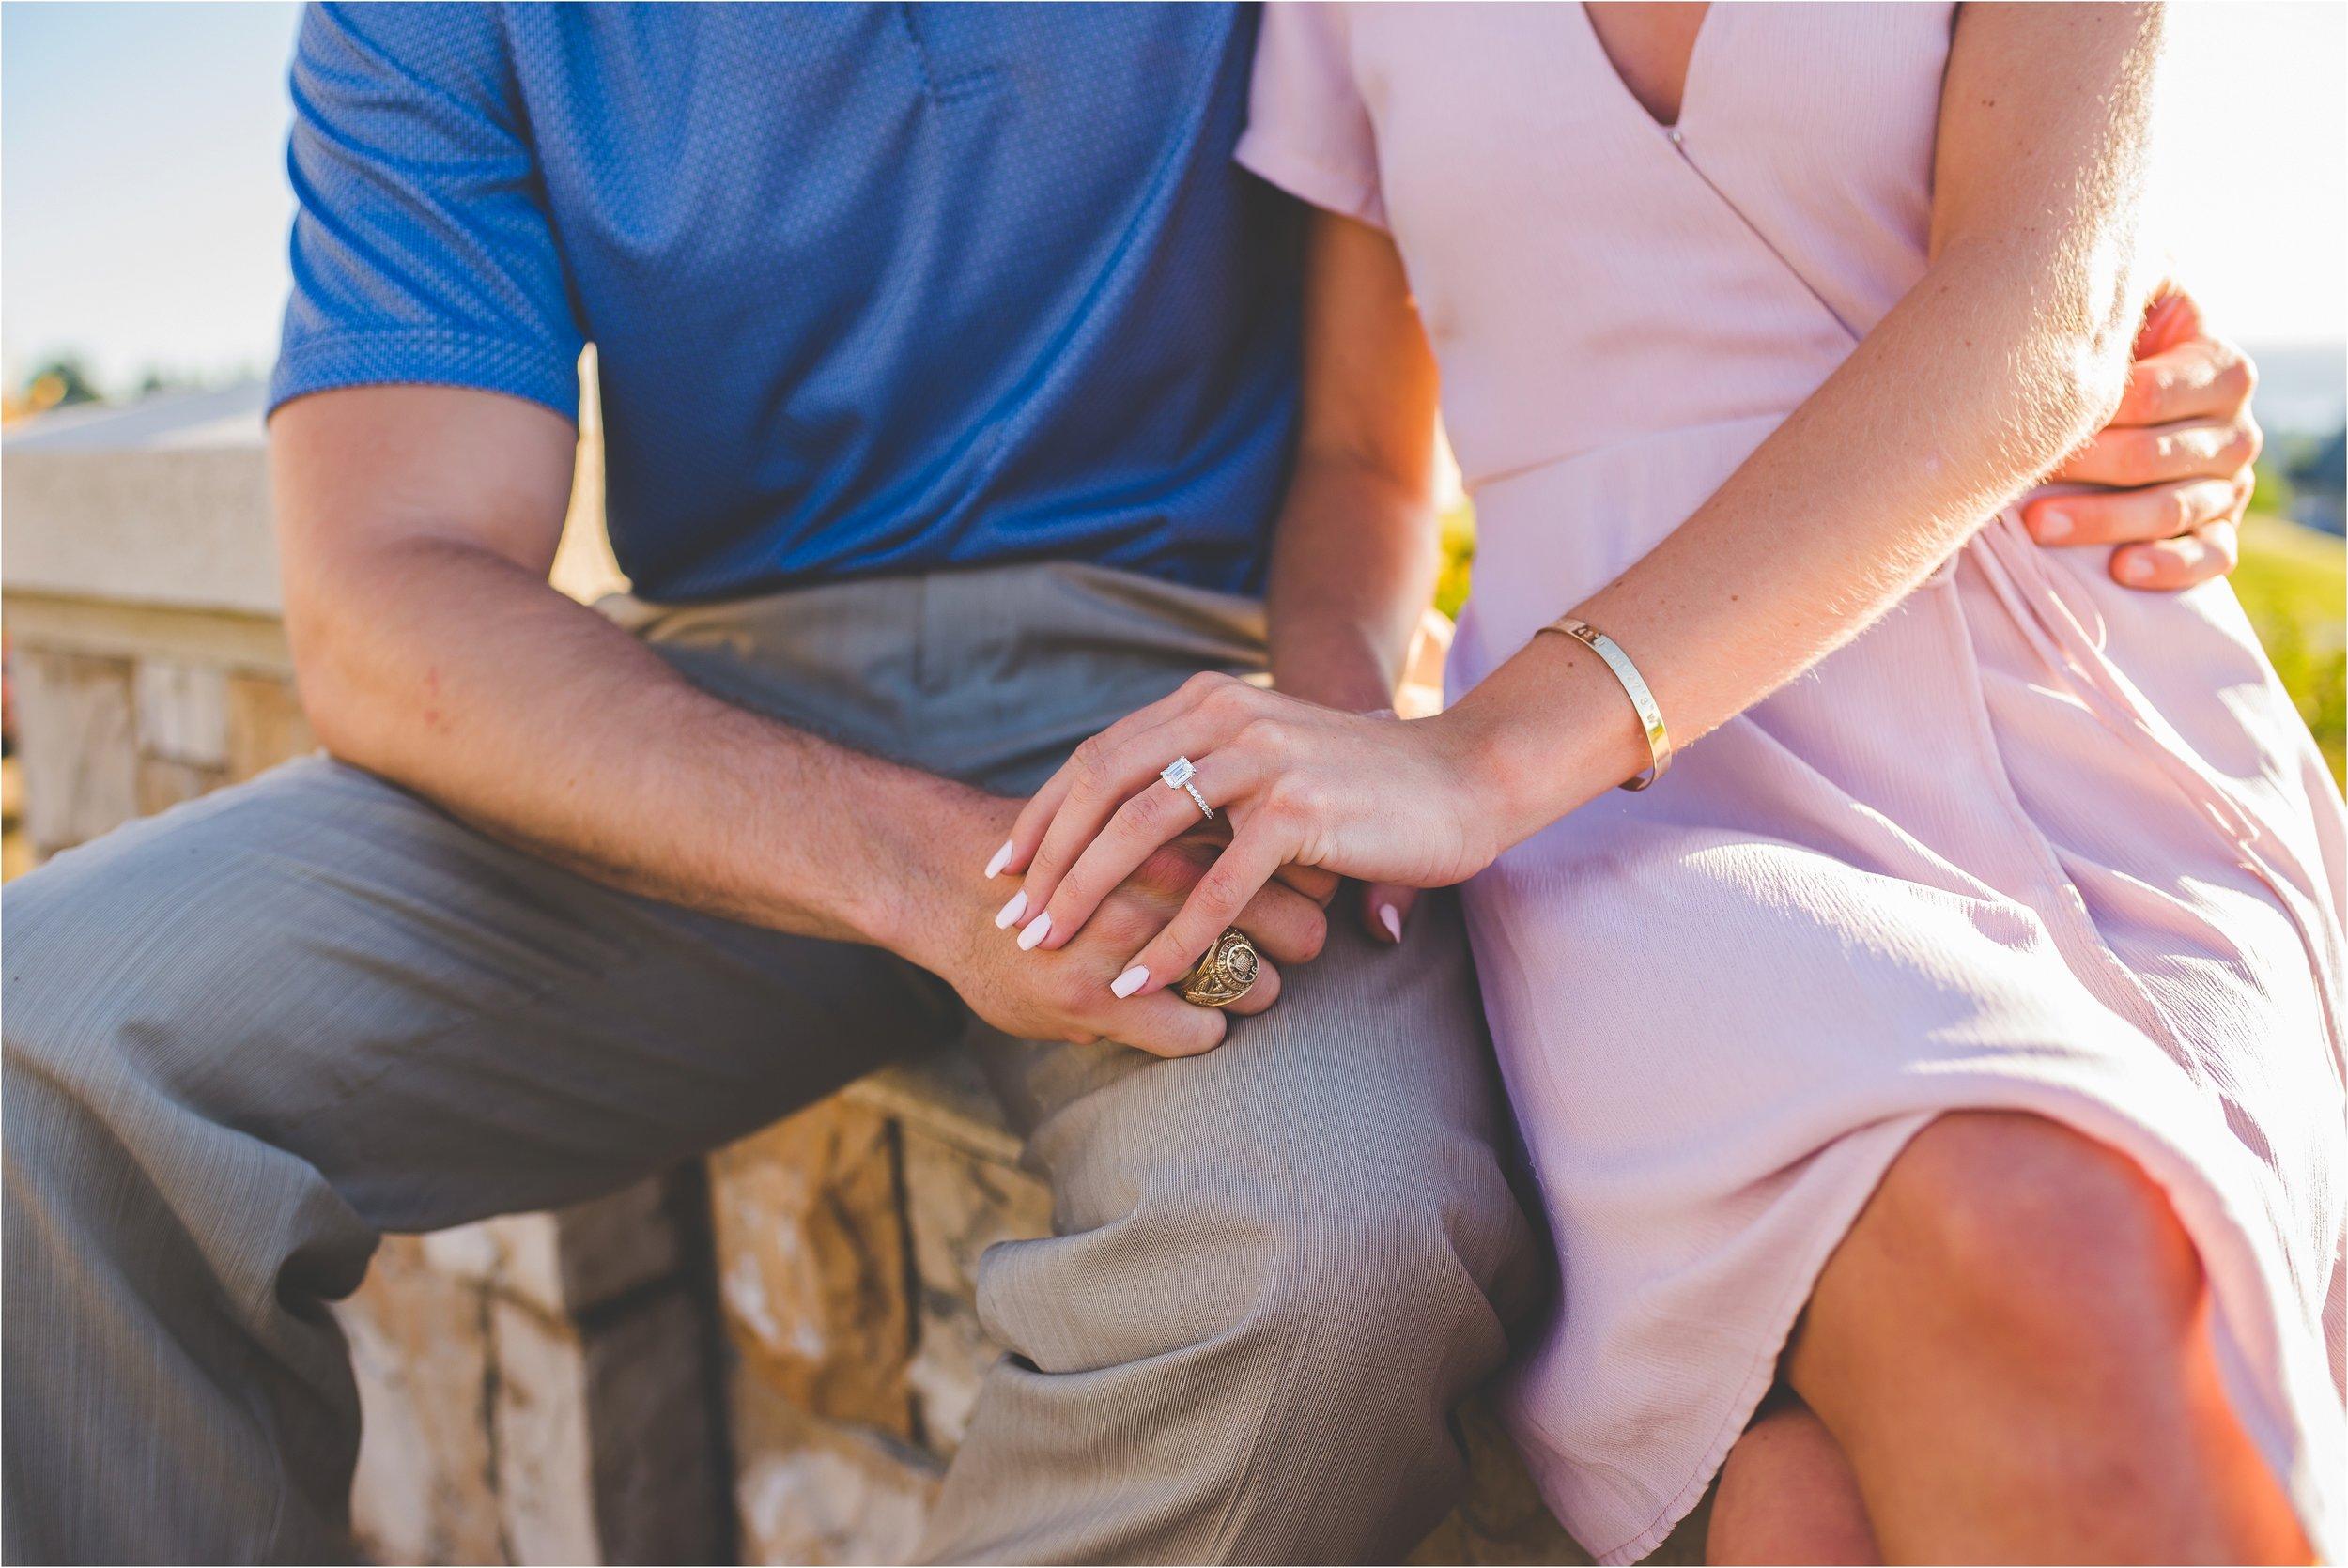 newcastle-golf-club-proposal-jannicka-mayte-seattle-washington-engagement-wedding-photographer_0022.jpg